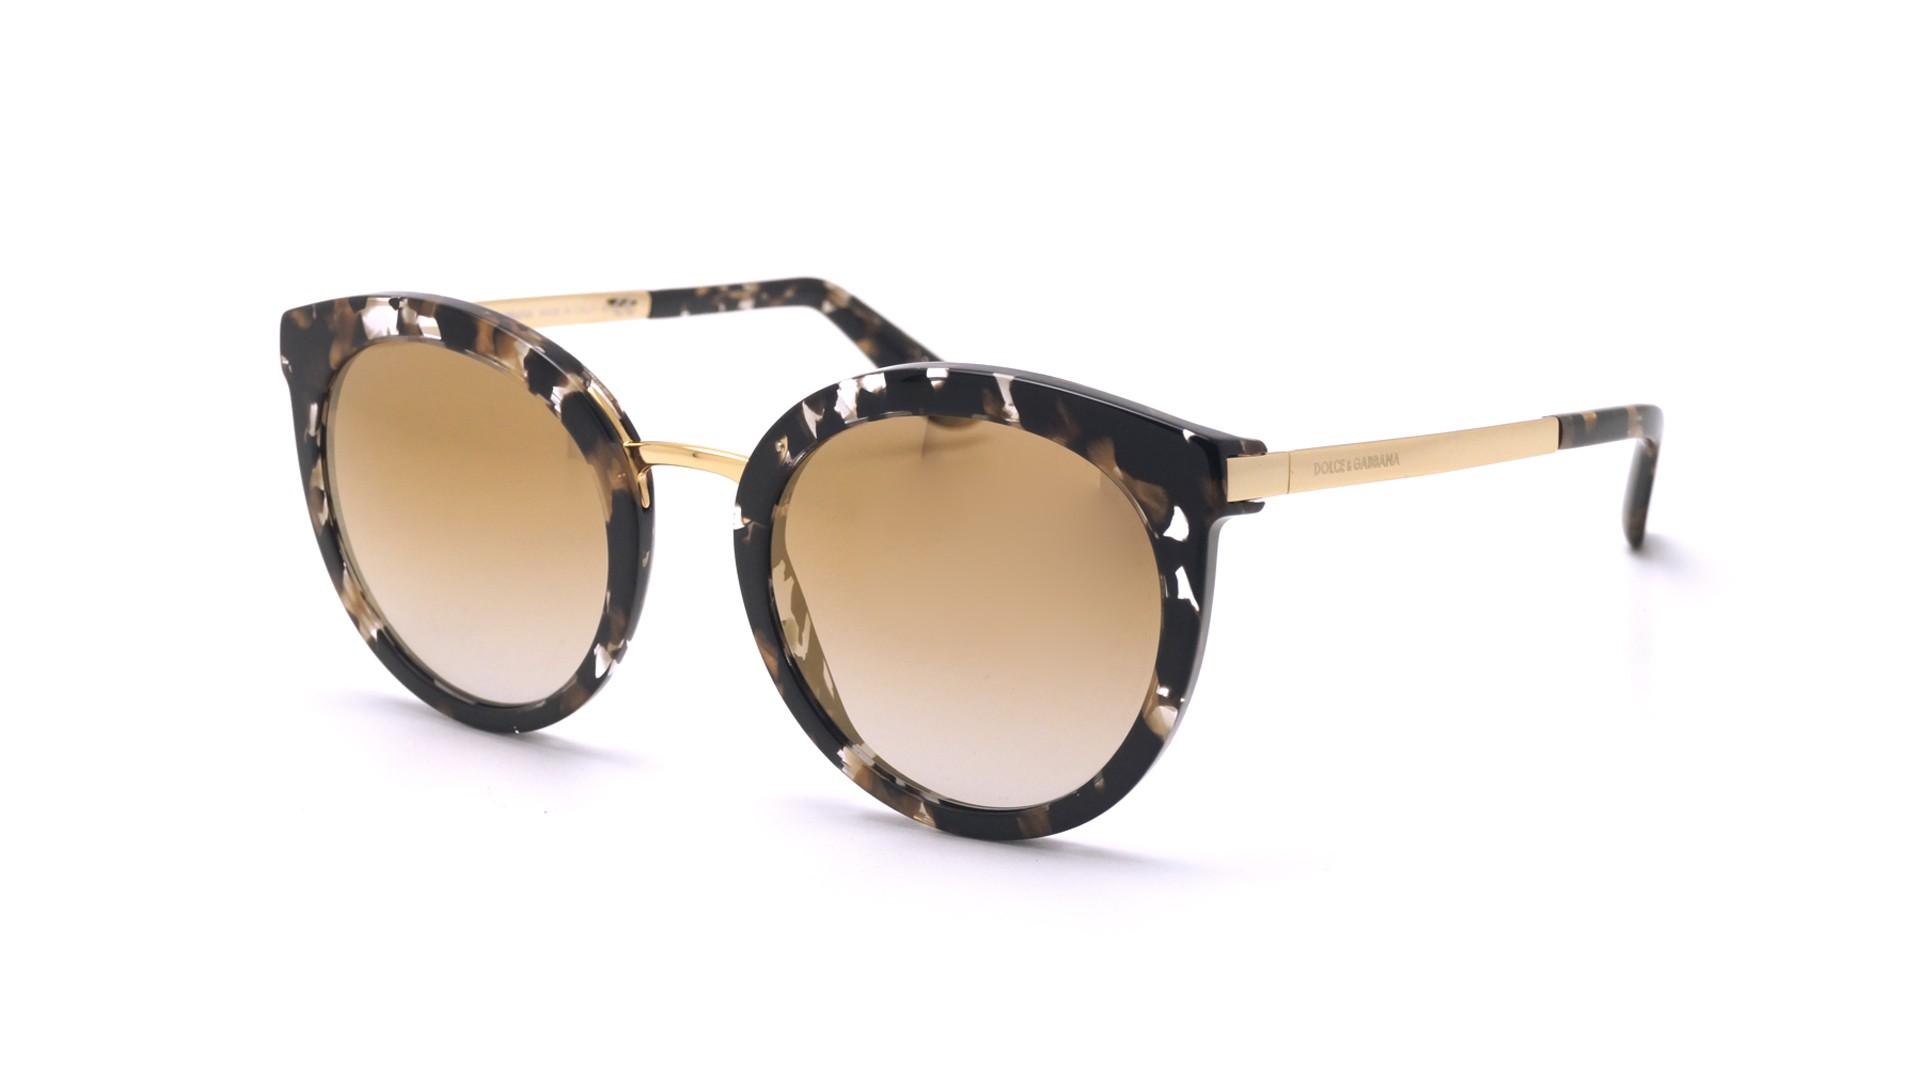 fb5ec68e047 Sunglasses Dolce   Gabbana DG4268 911 6E 52-22 Tortoise Medium Gradient  Mirror